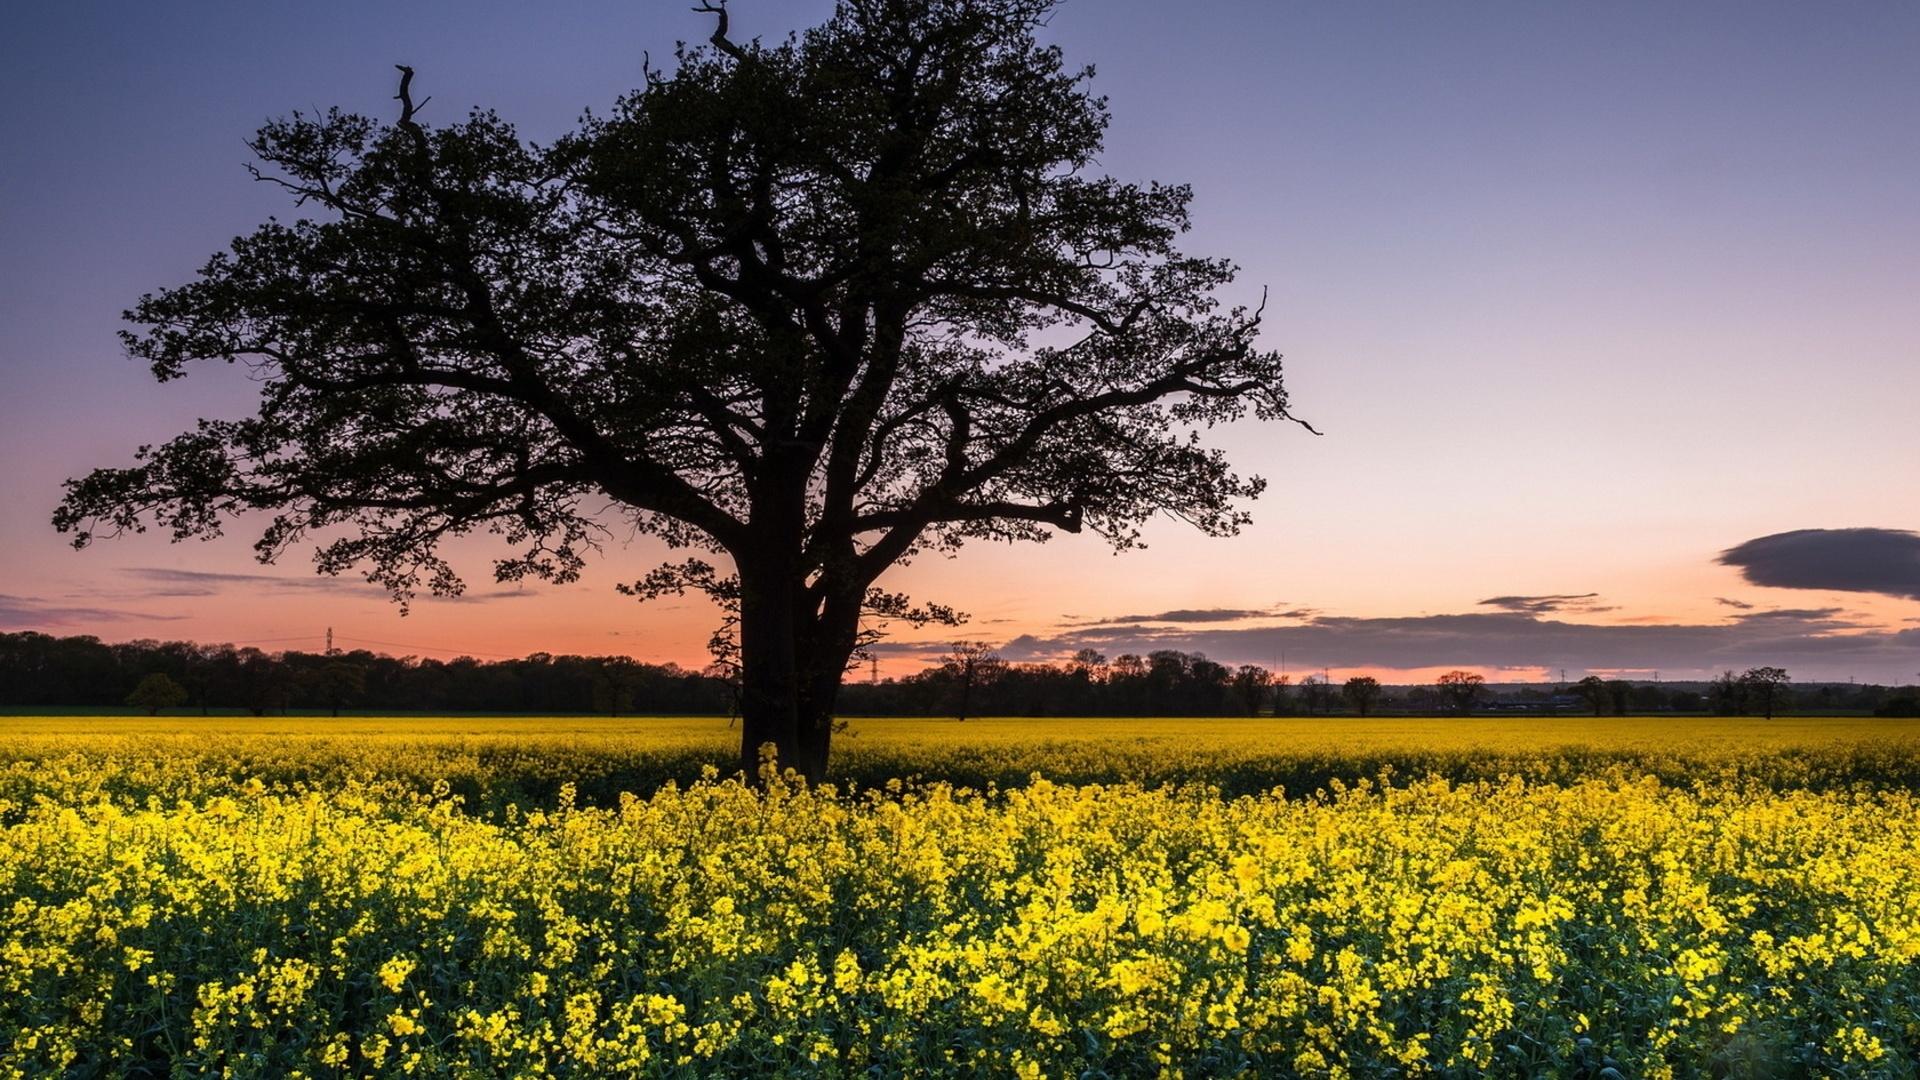 Yellow Nature cool wallpaper